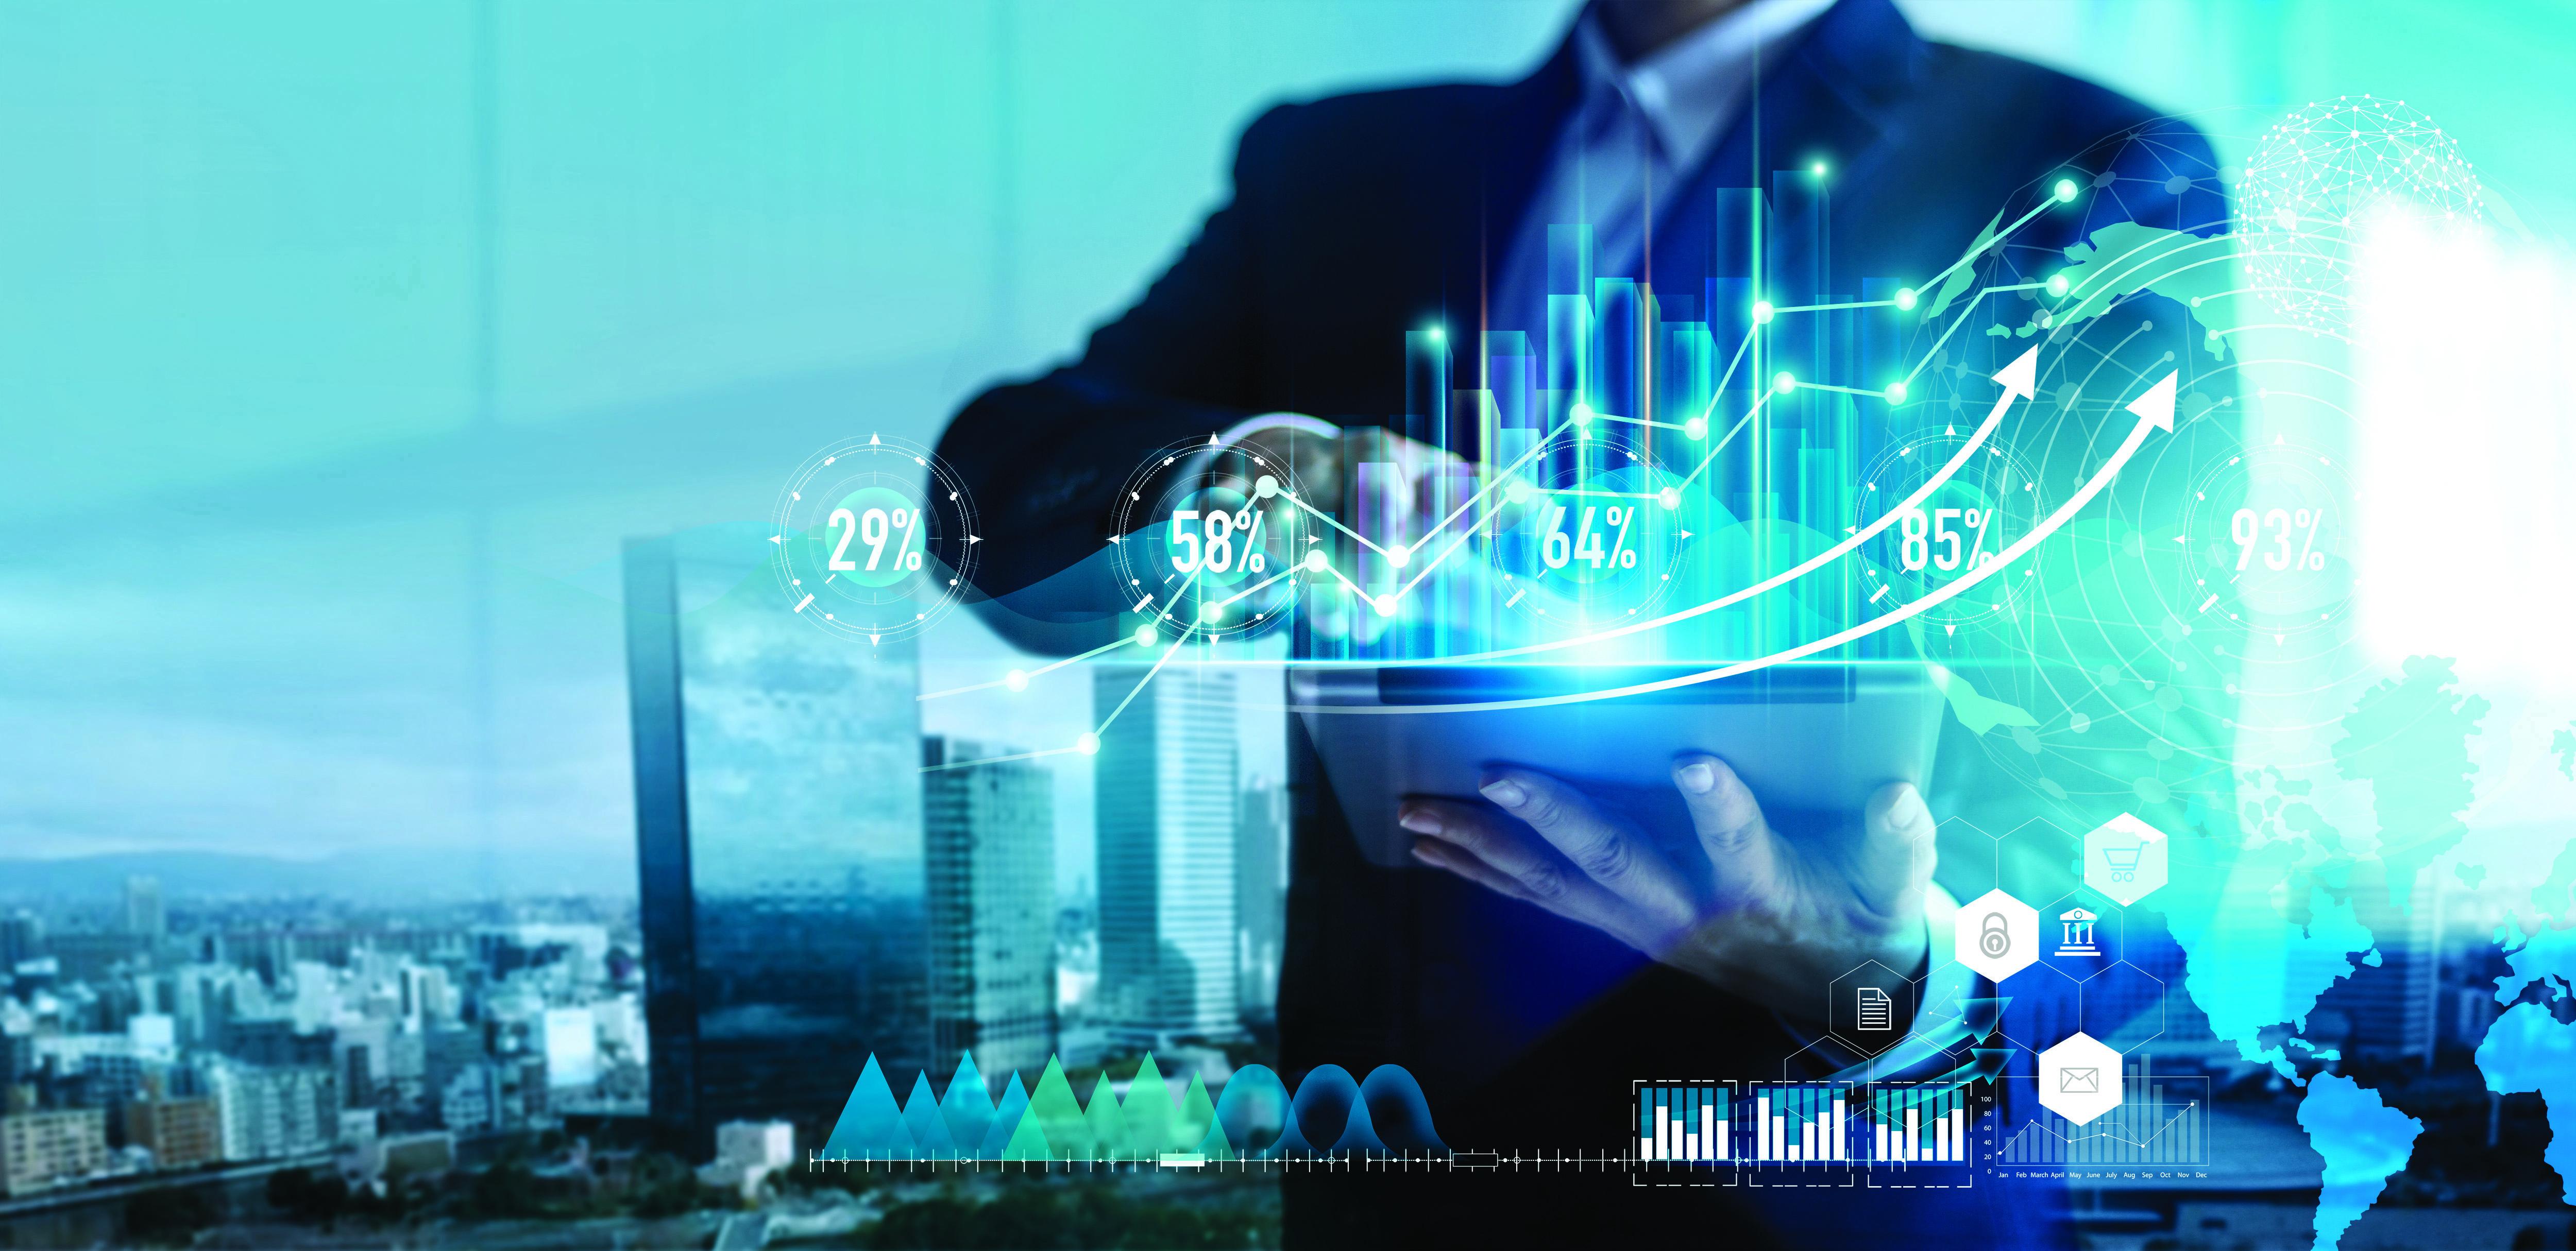 Webinar Recap: Shifting Demands on the Tech Organization